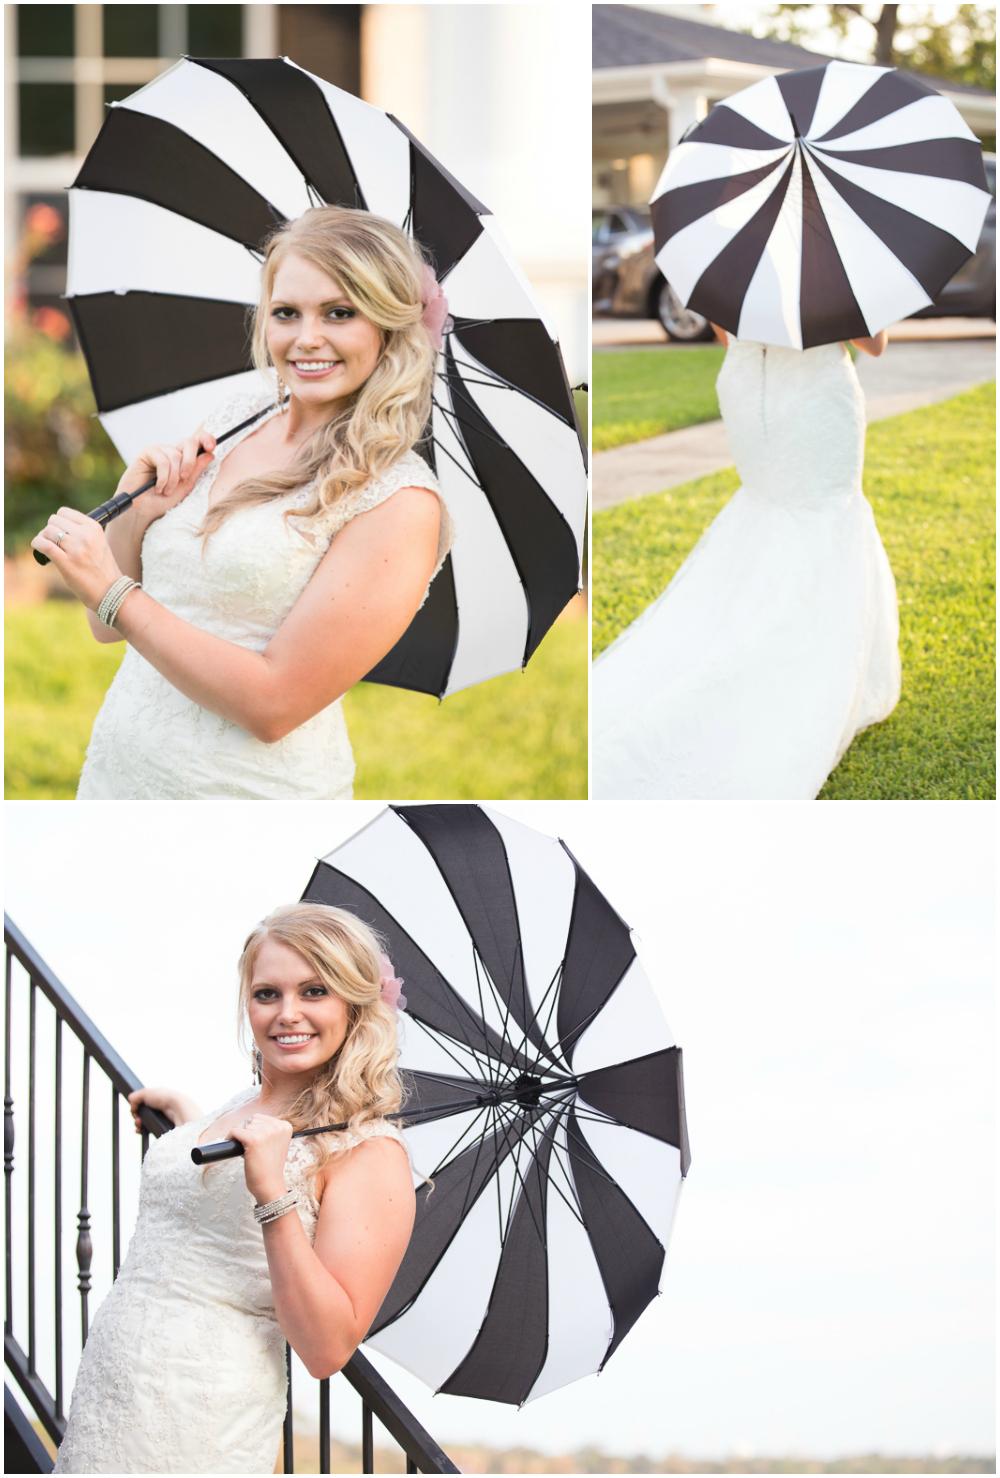 Atascocita Photography Bridal Umbrella